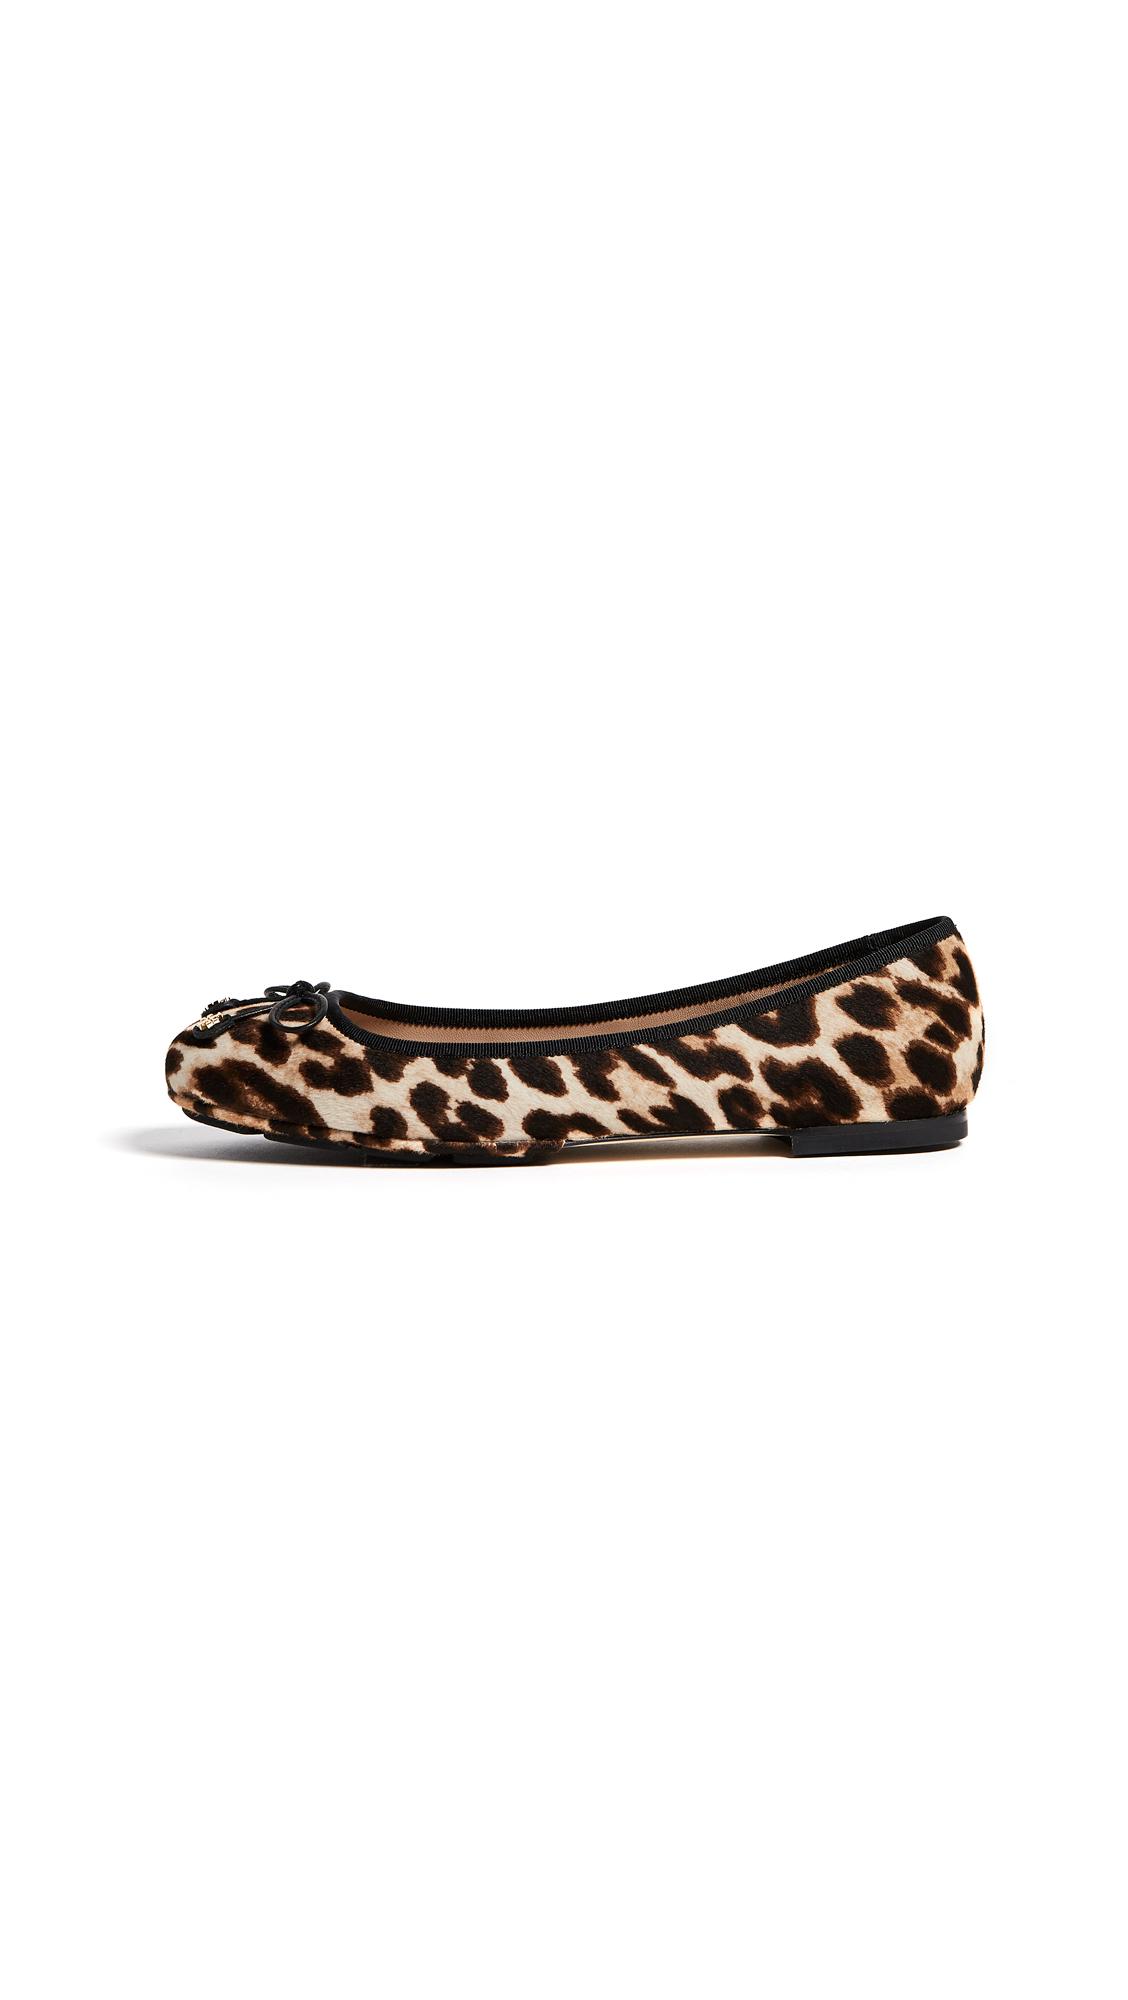 Tory Burch Laila Driver Ballet Flats - Leopard